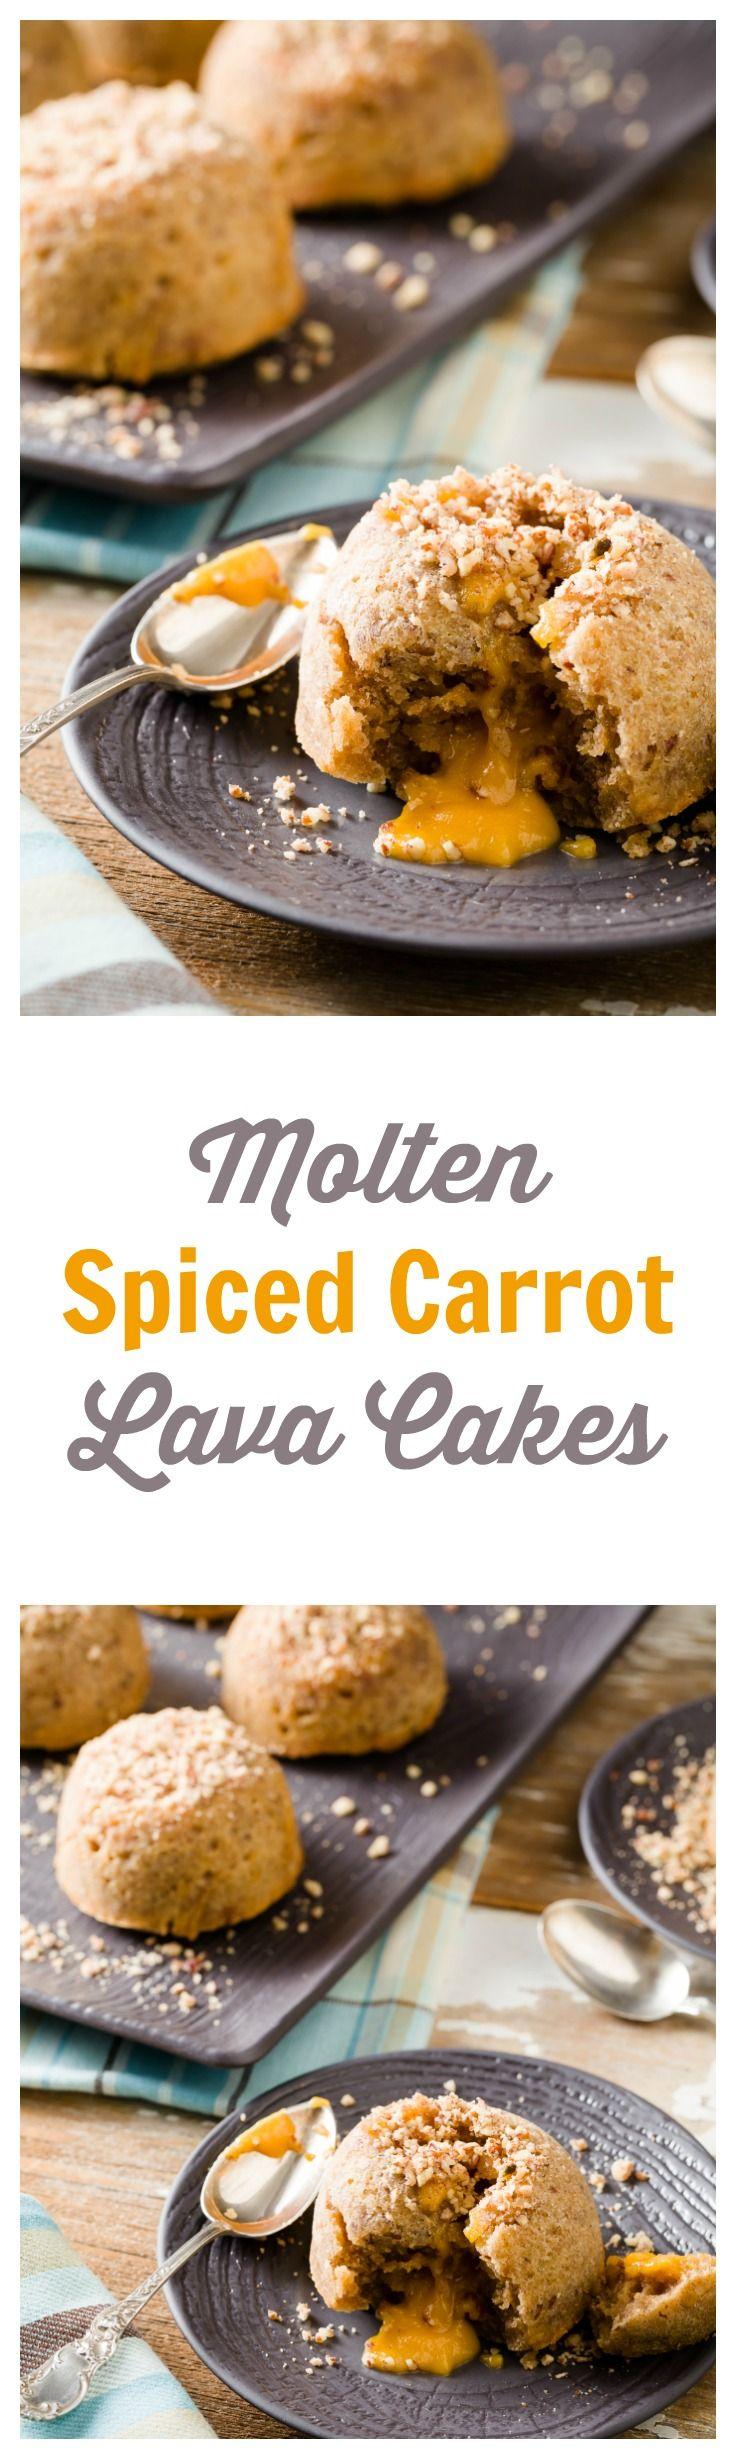 Spiced Carrot Lava Cake